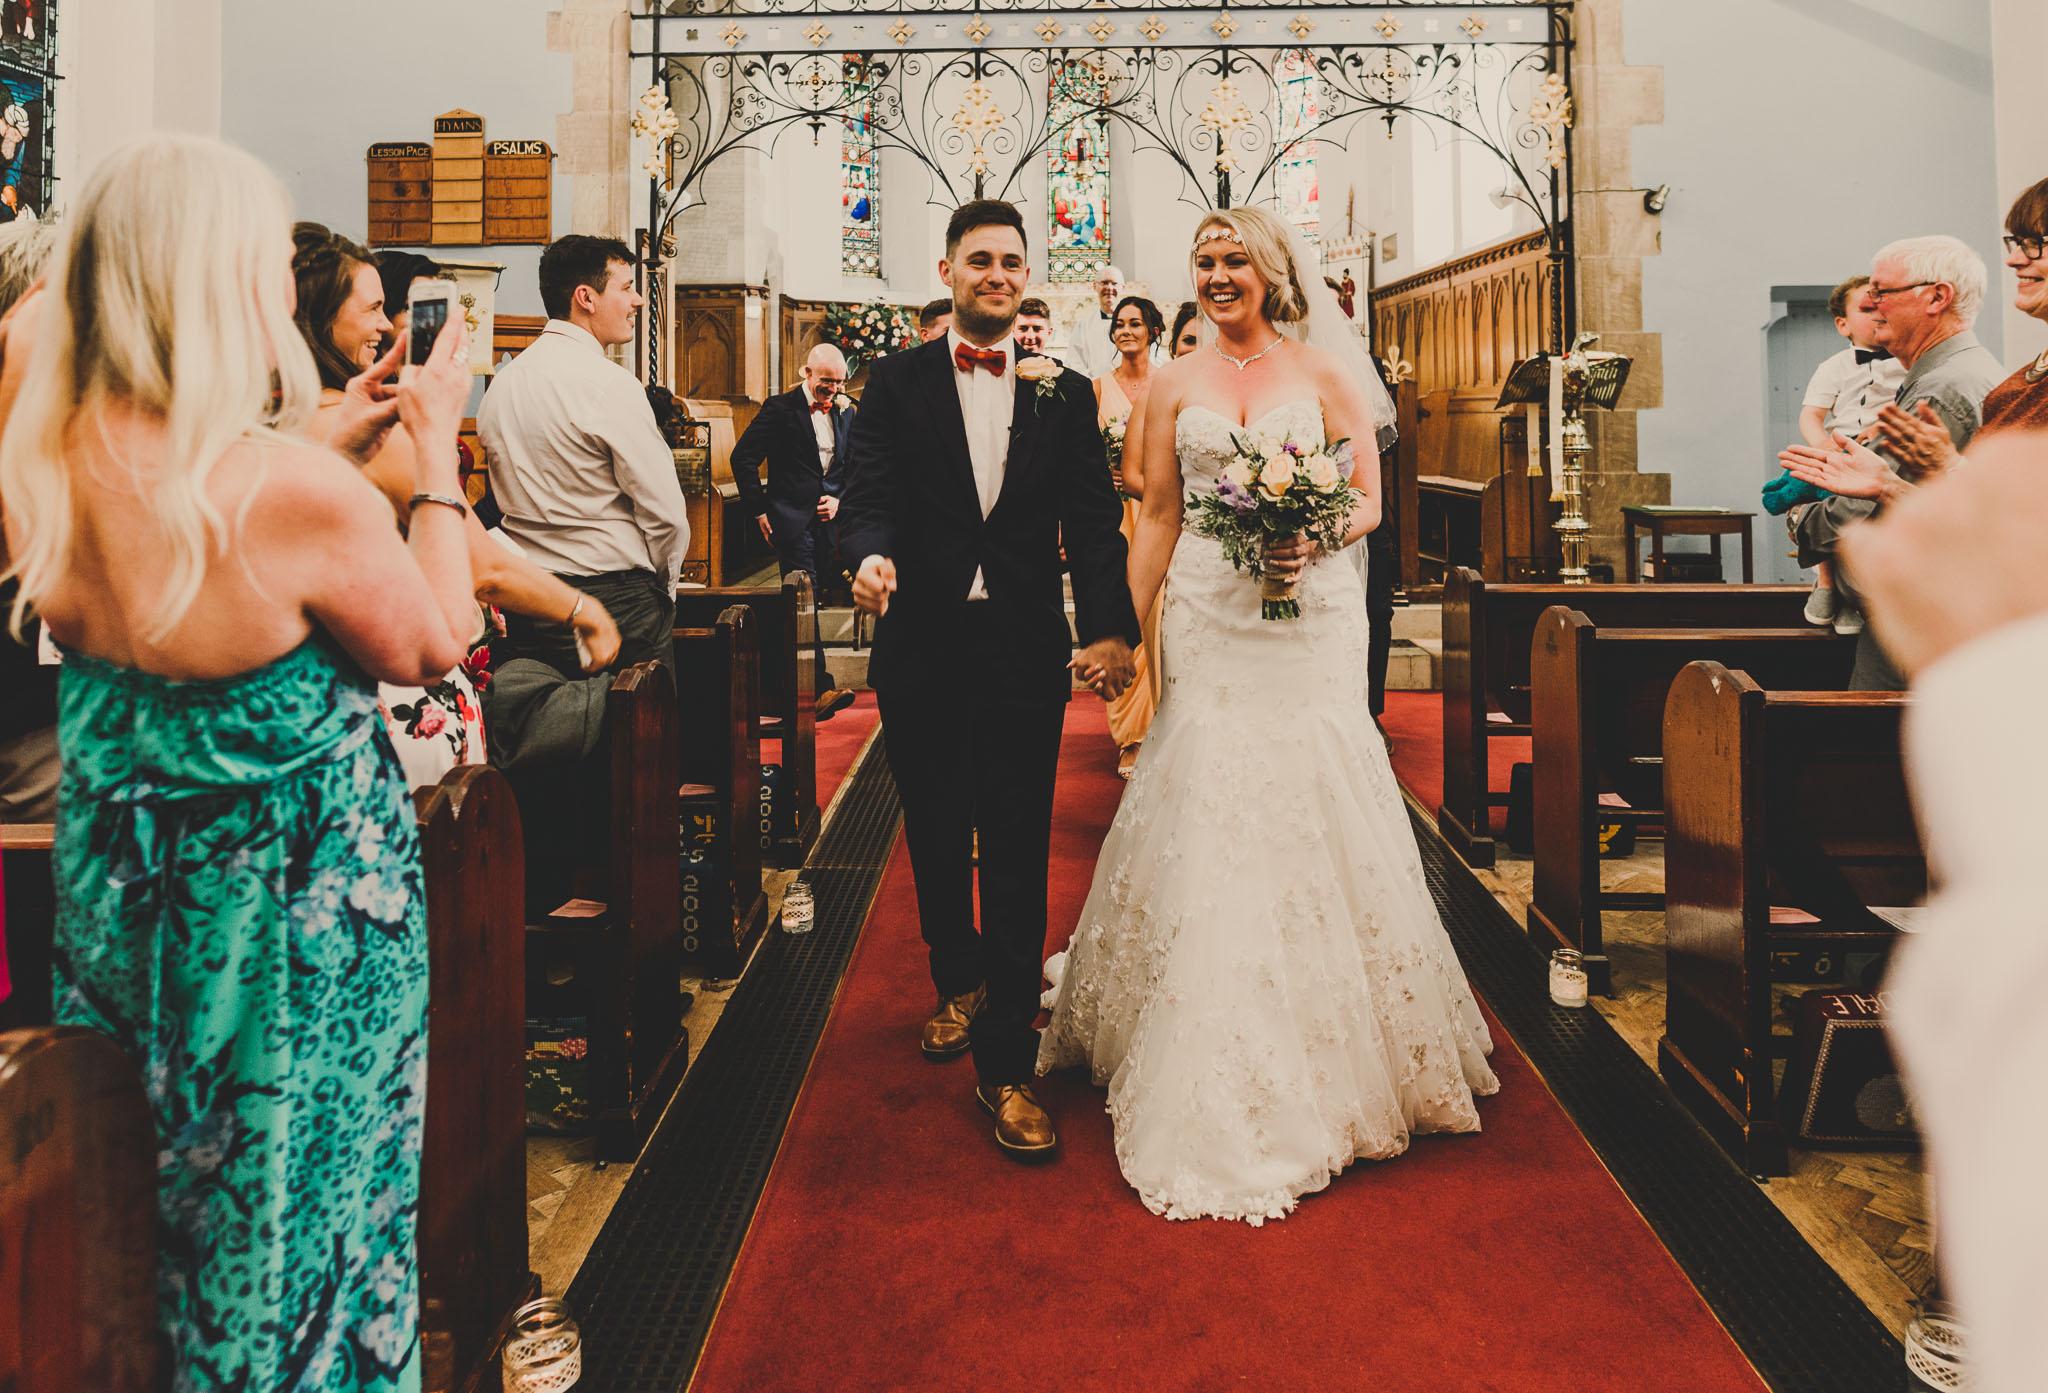 2 romantic and intimate wedding phtography (20).jpg